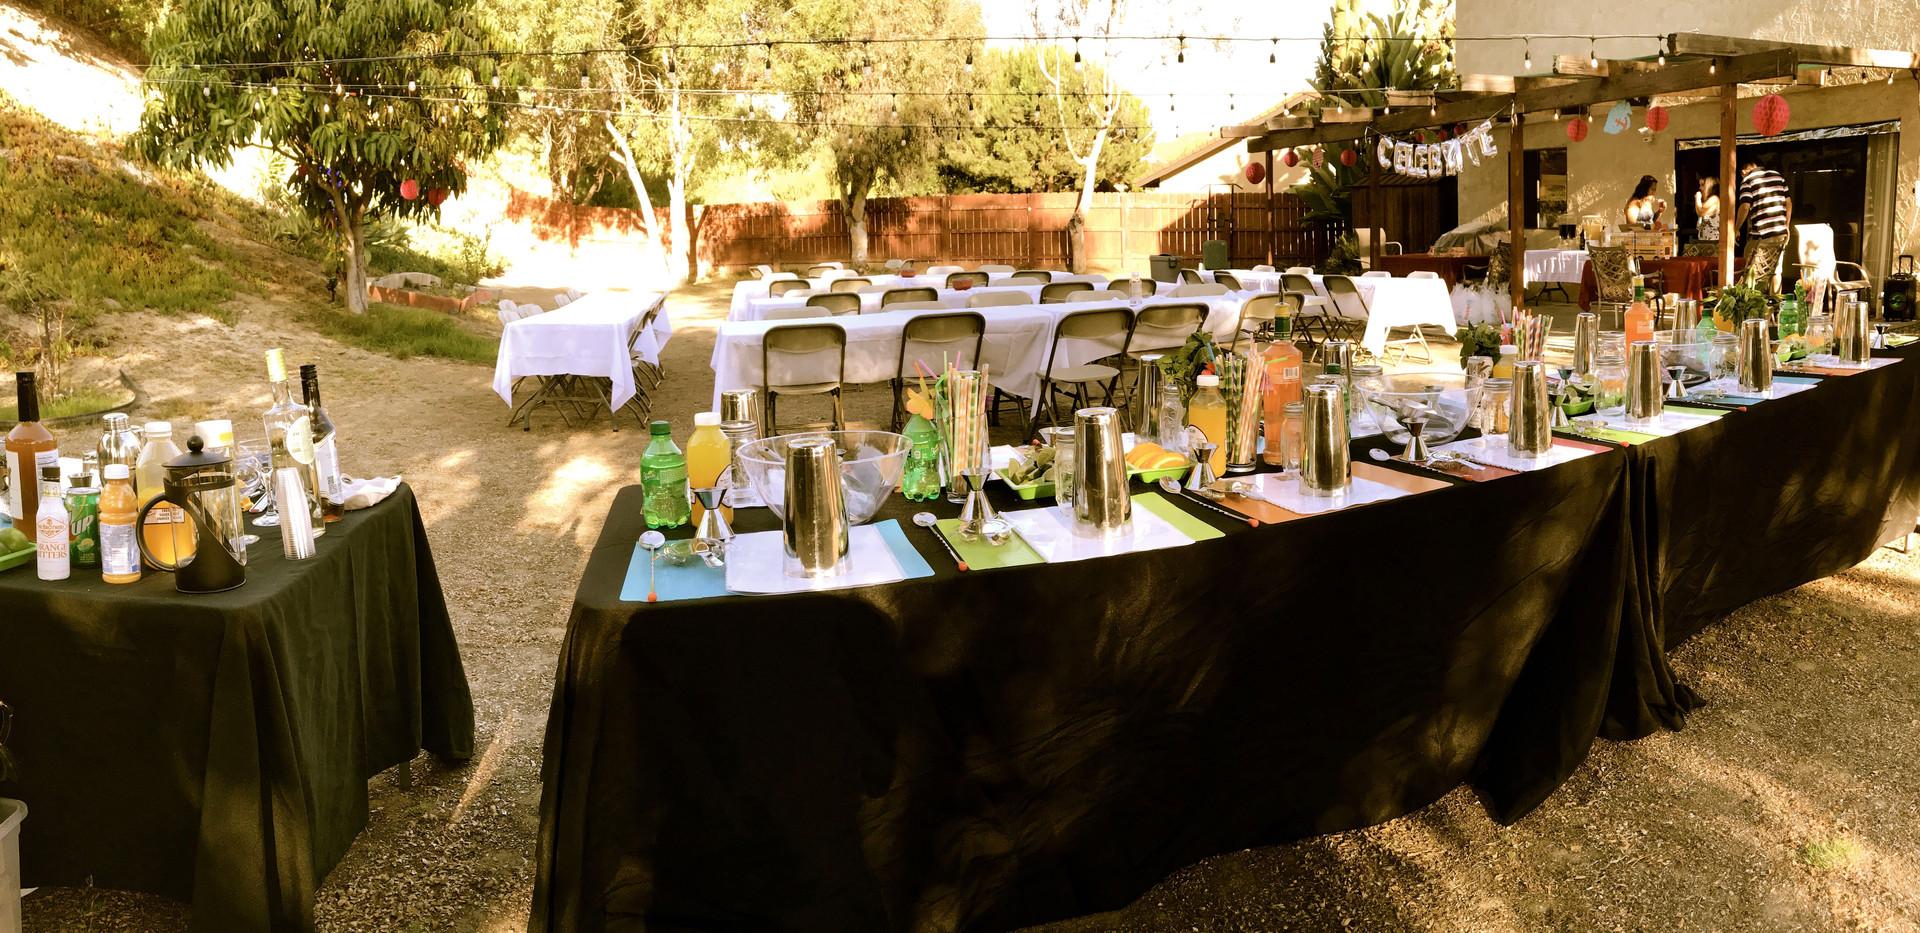 21st backyard birthday party